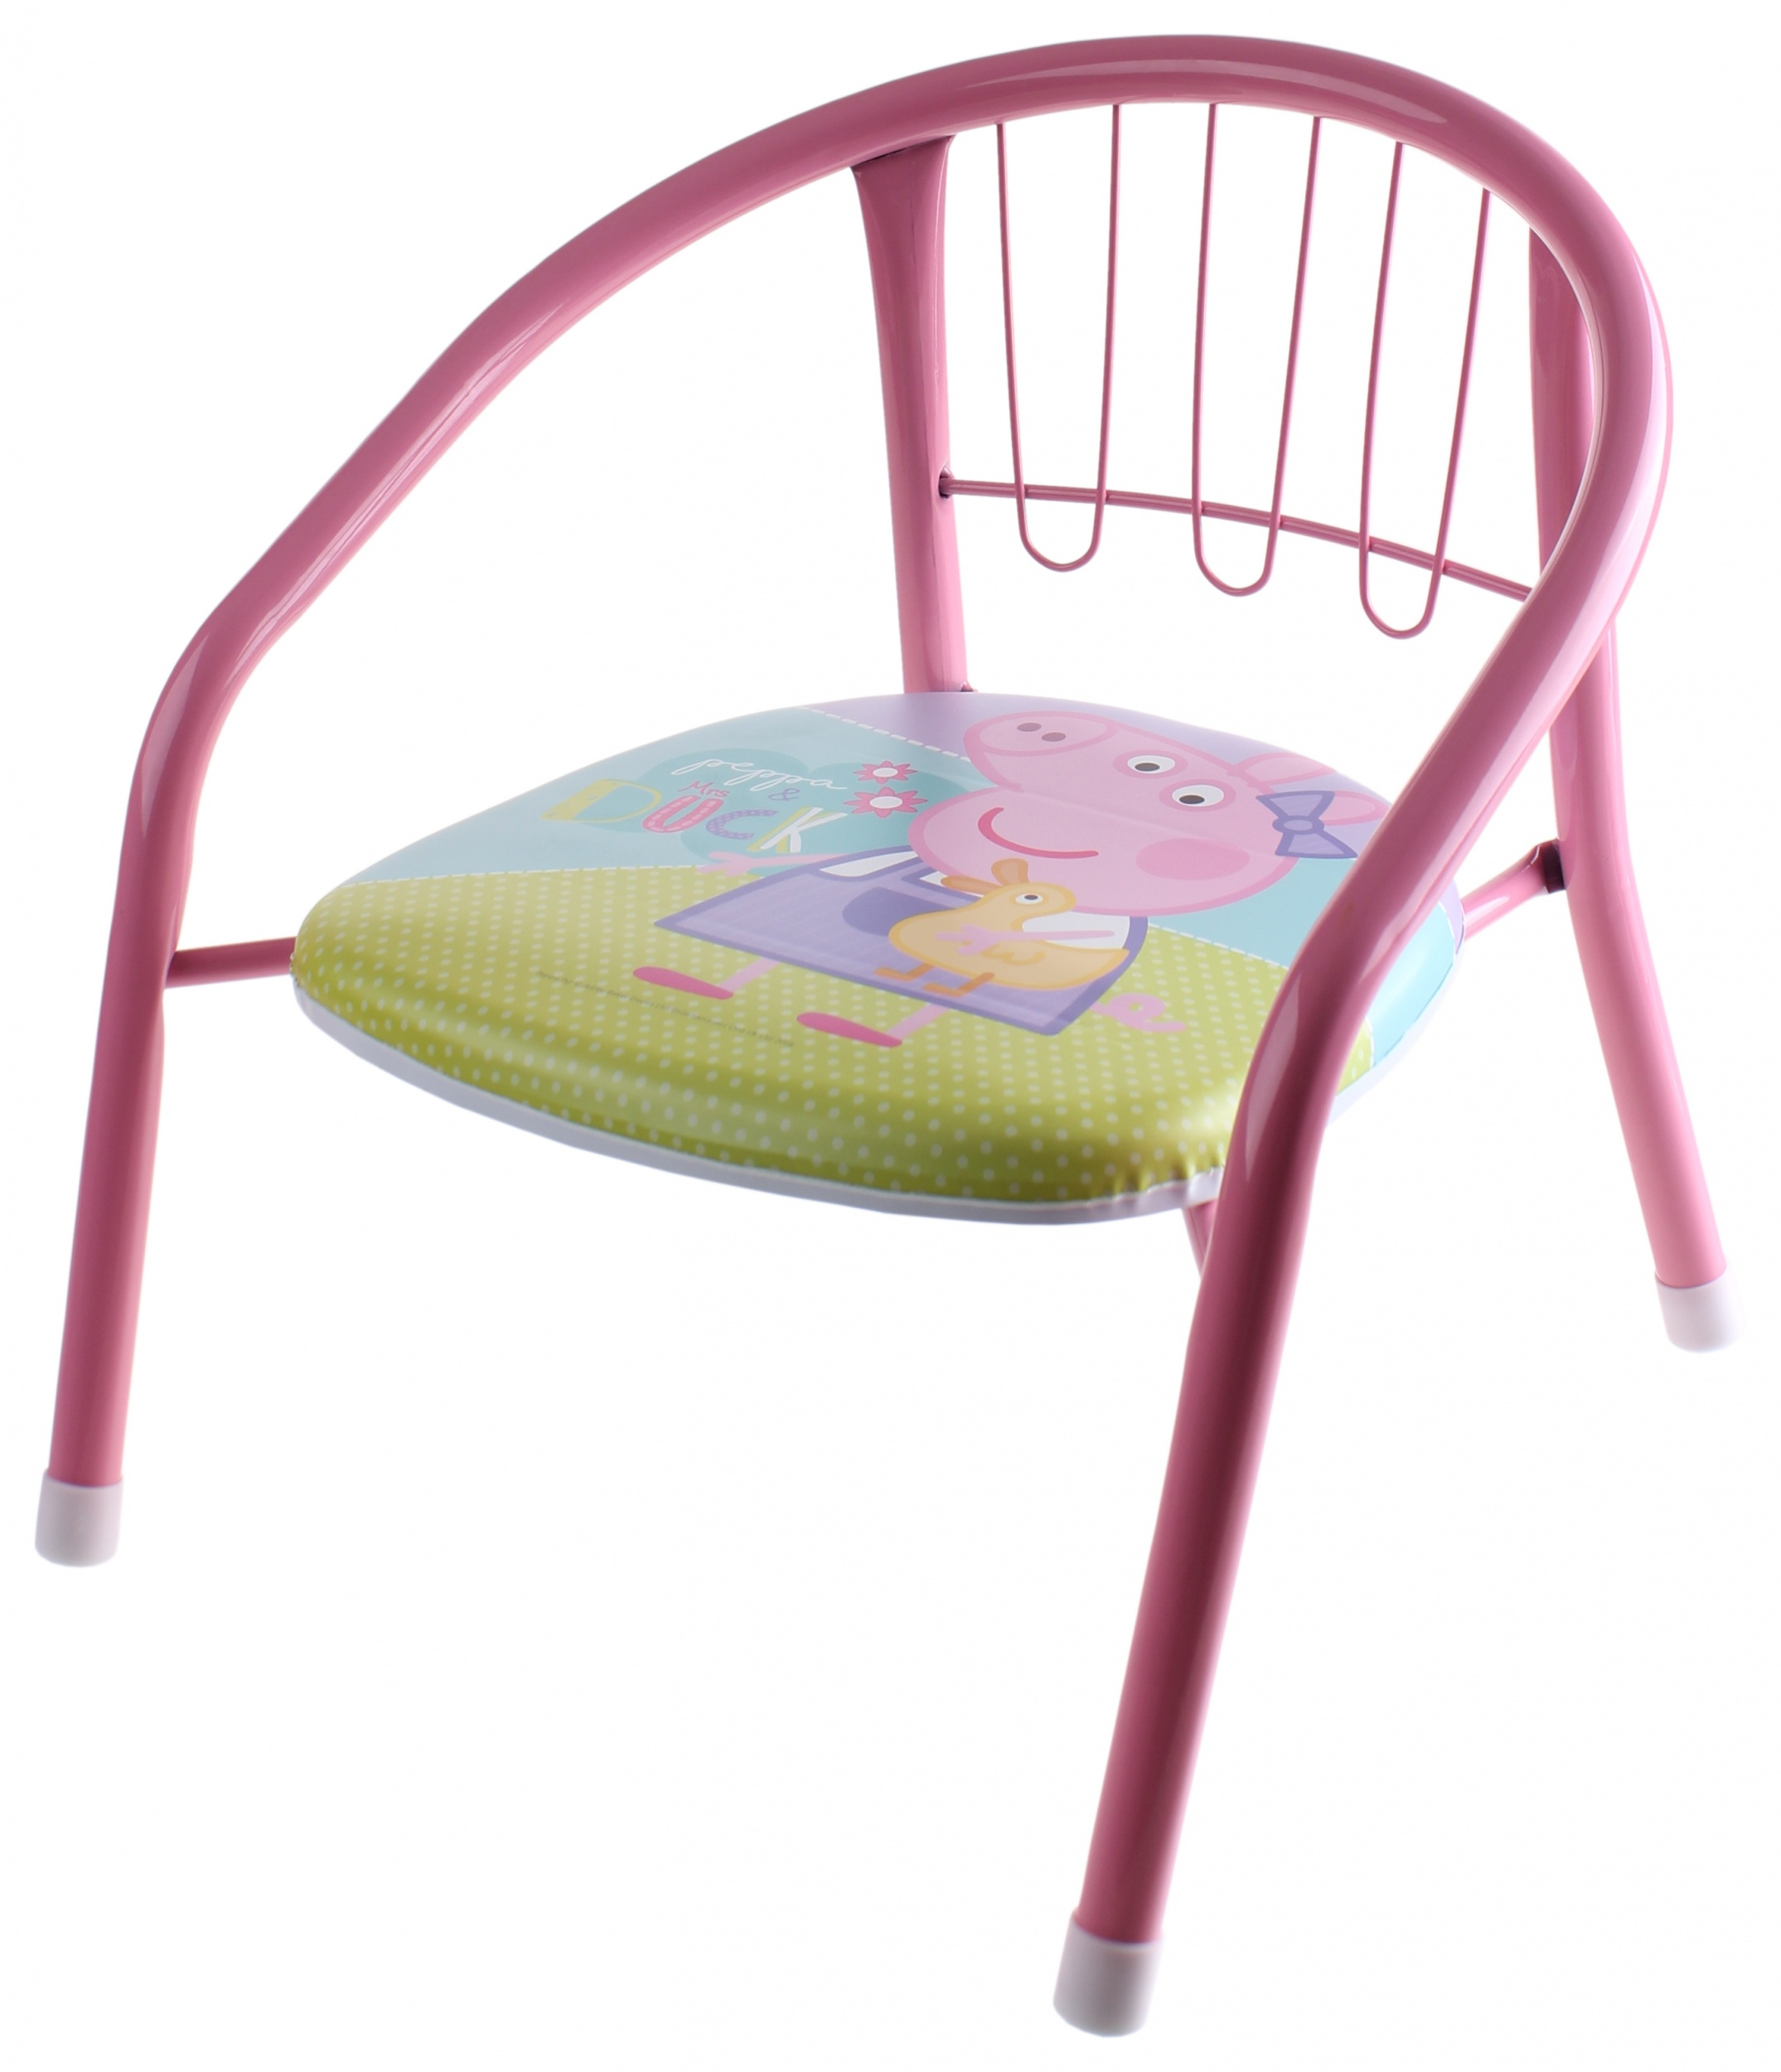 Peppa Pig Patio Chair Folding Fence Ideas Site